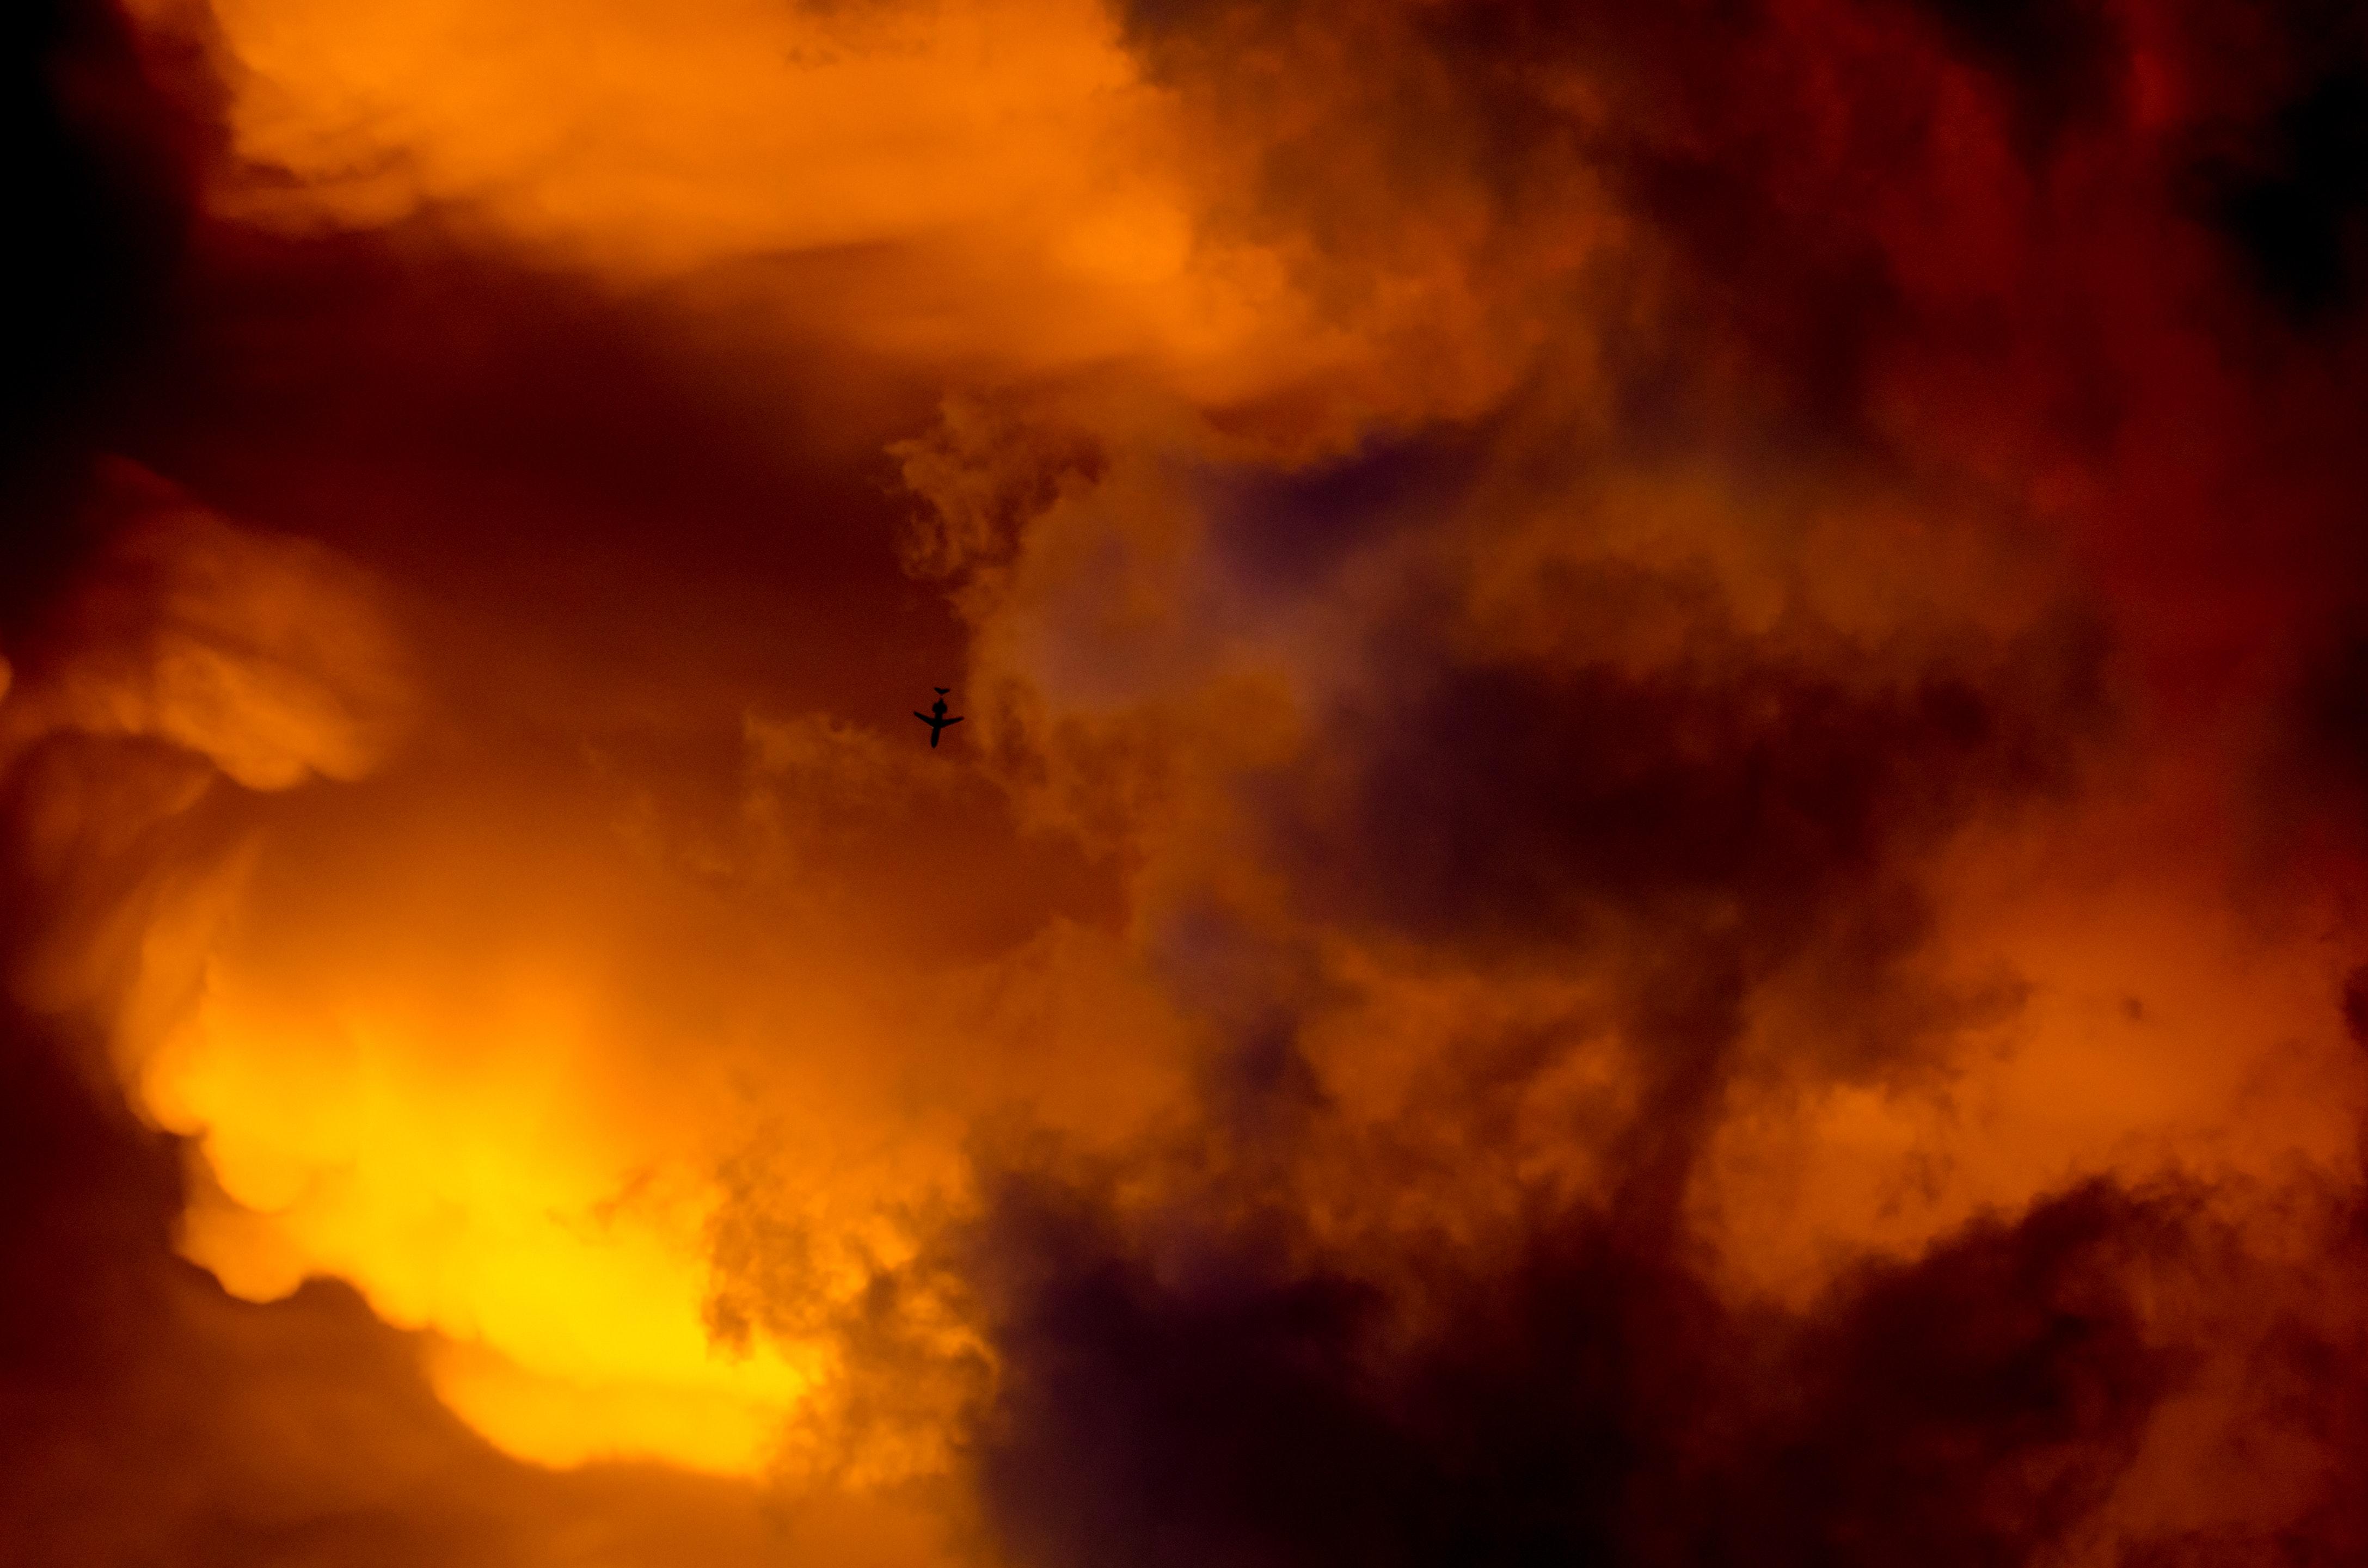 Airplane silhouette and orange sky photo